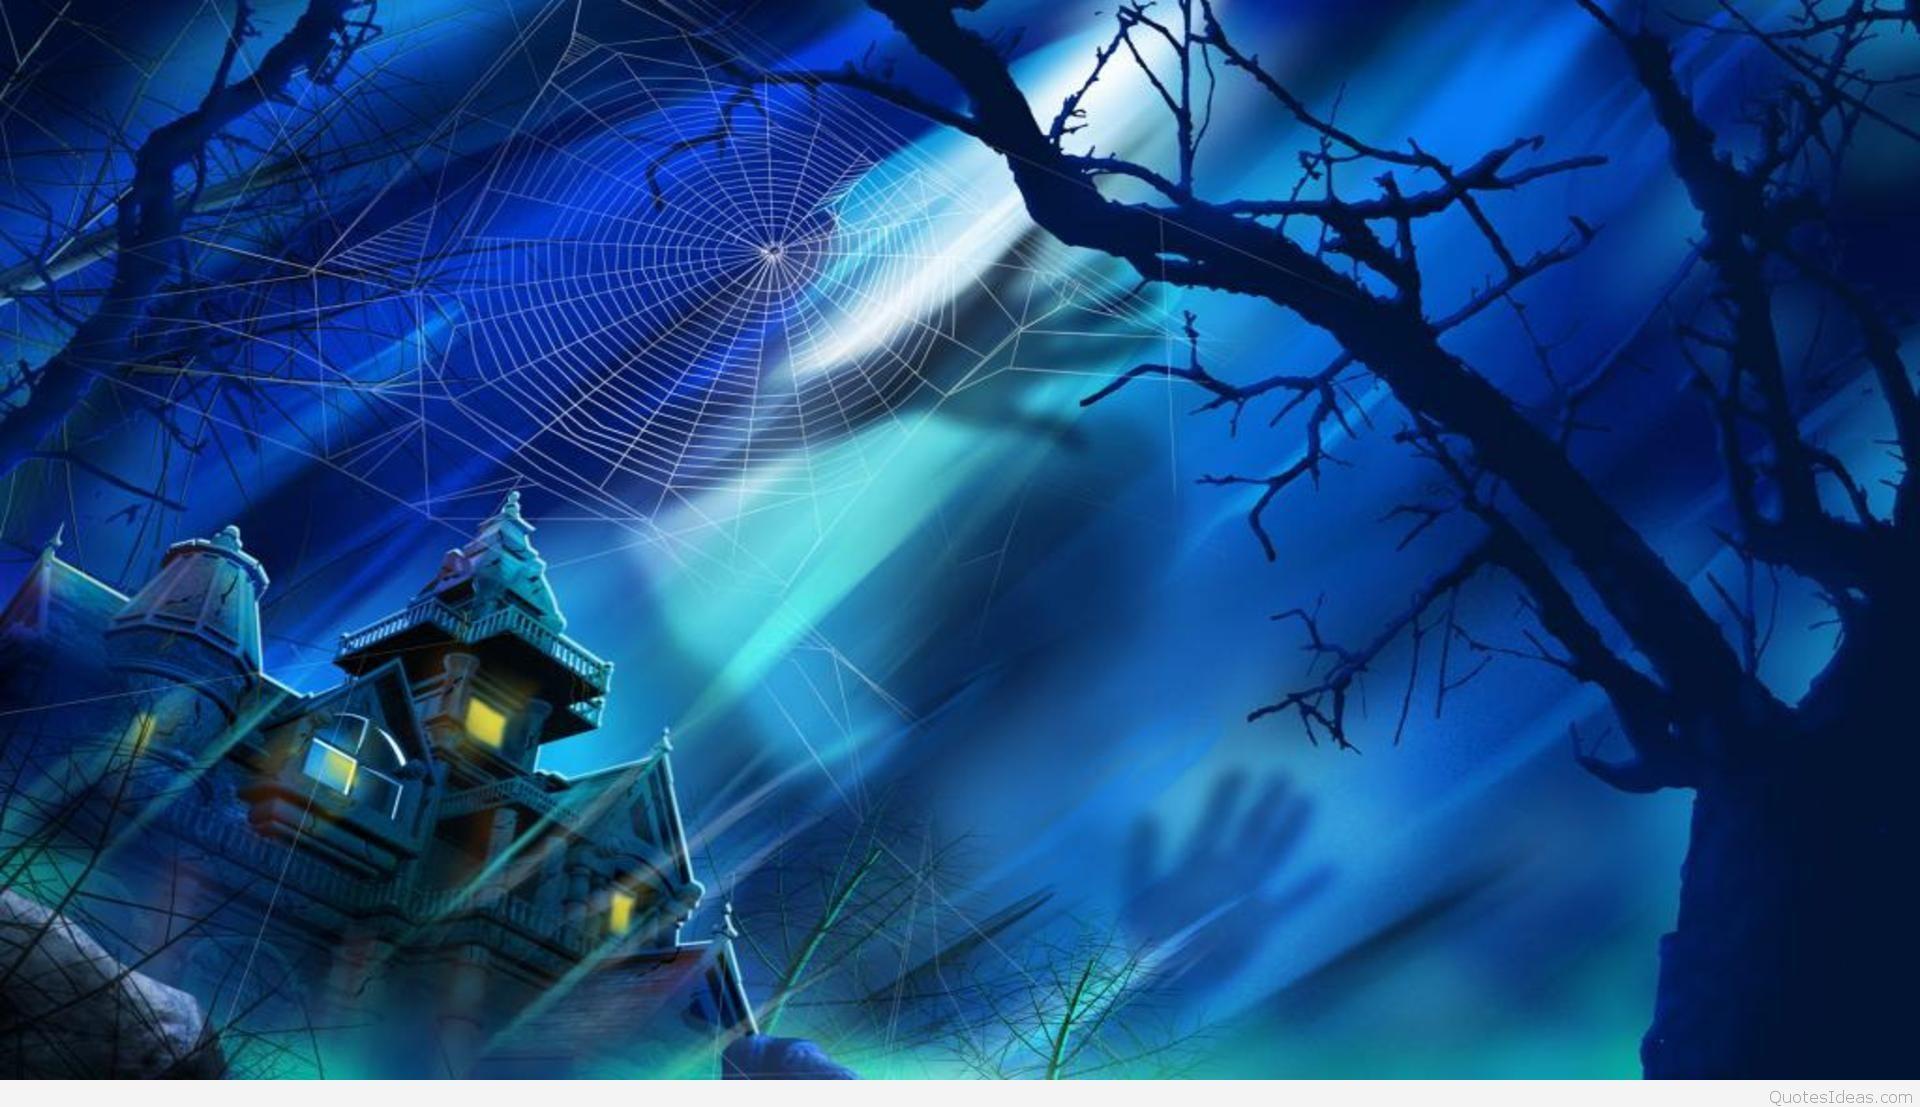 Blue wallpaper Happy Halloween night 1920x1107